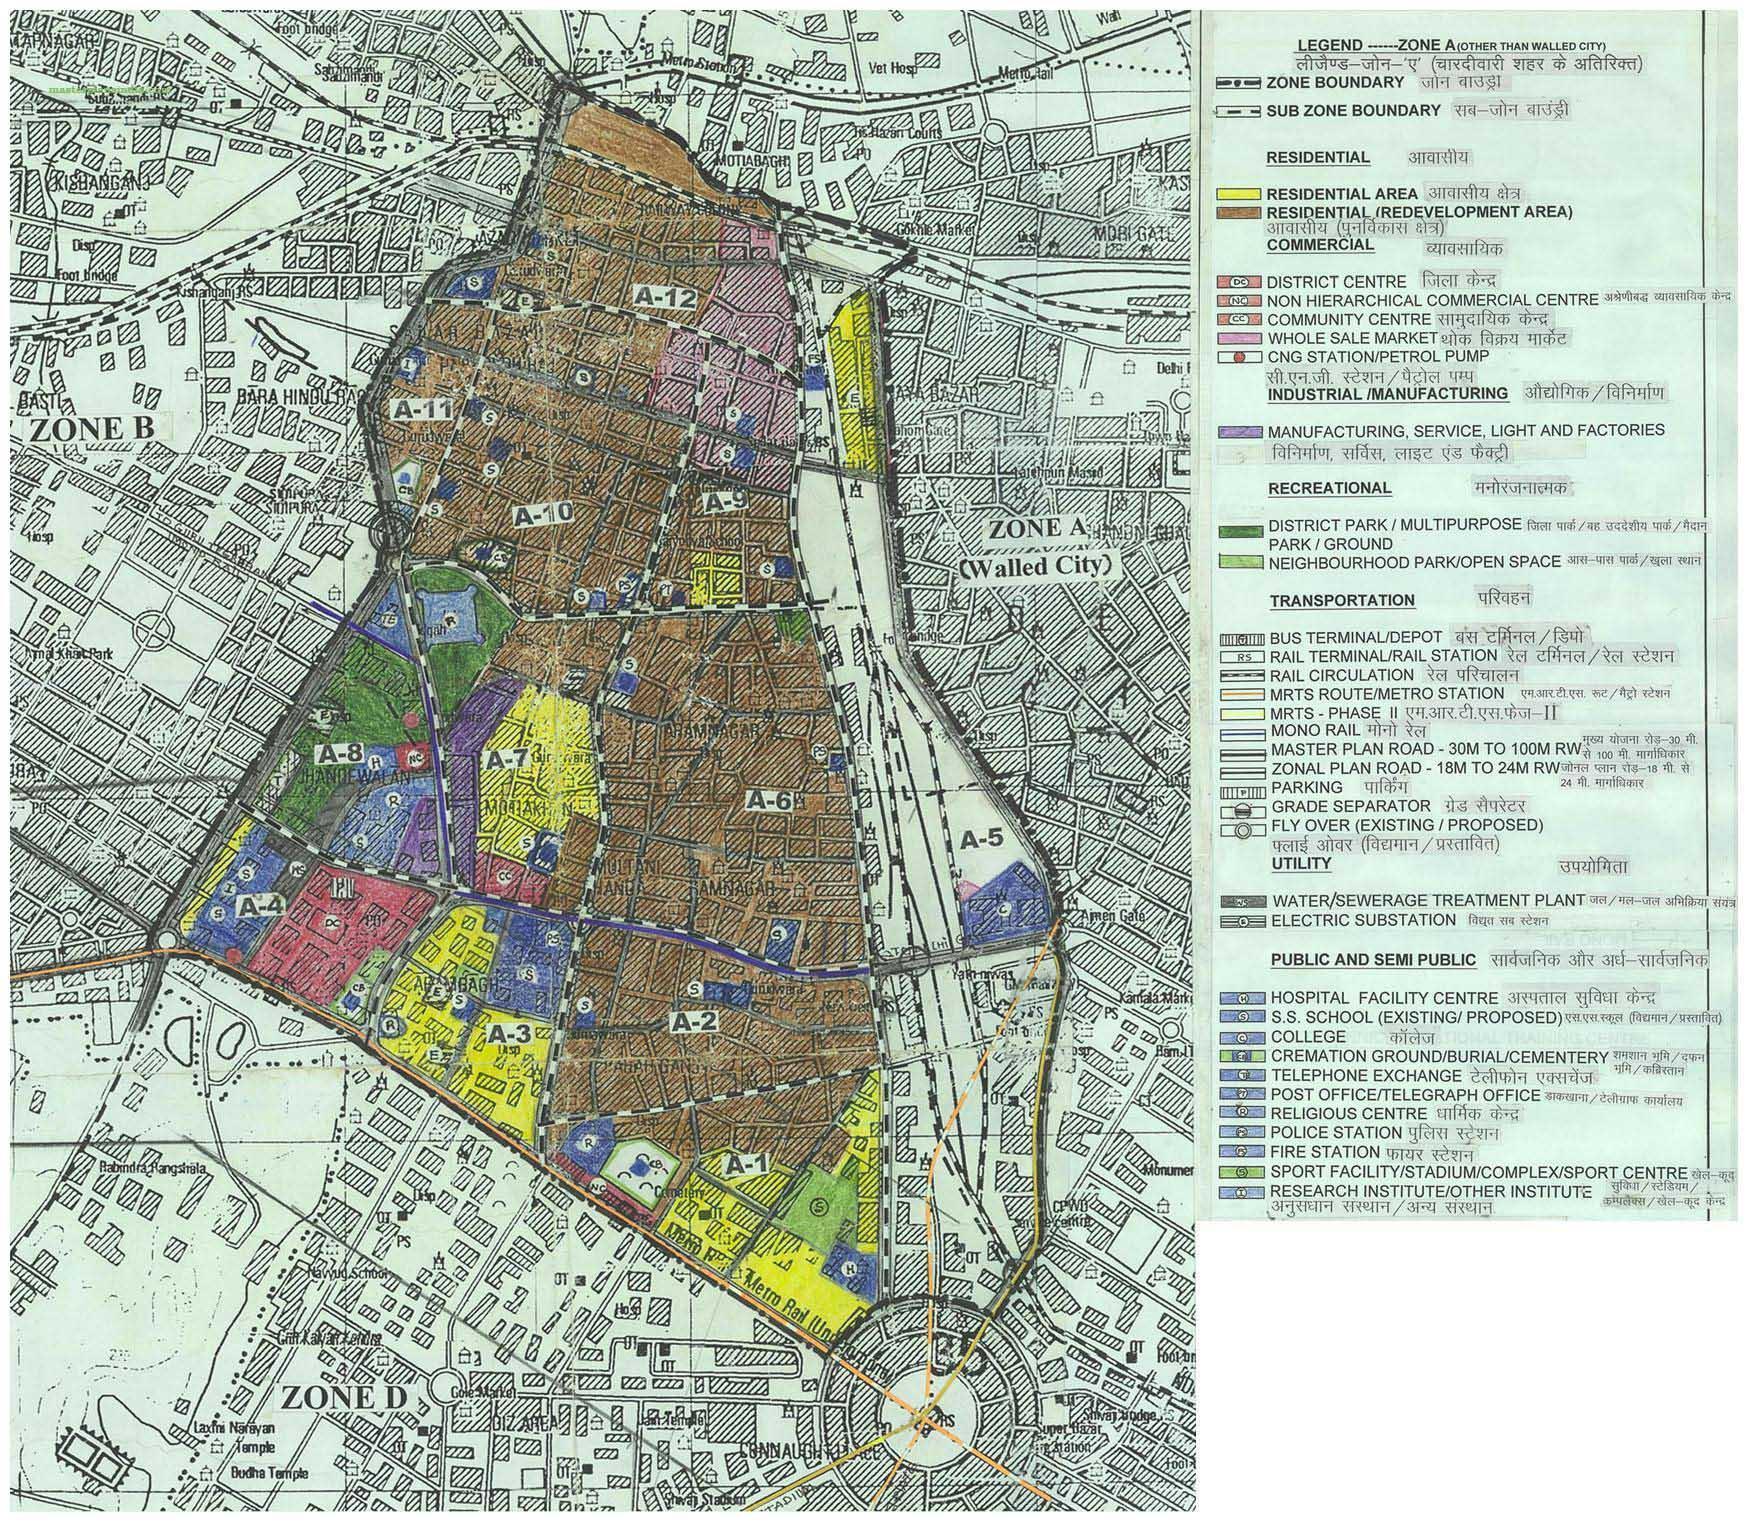 map-zone-a-delhi-old-city Janani Suraksha Yojana Application Form Download on